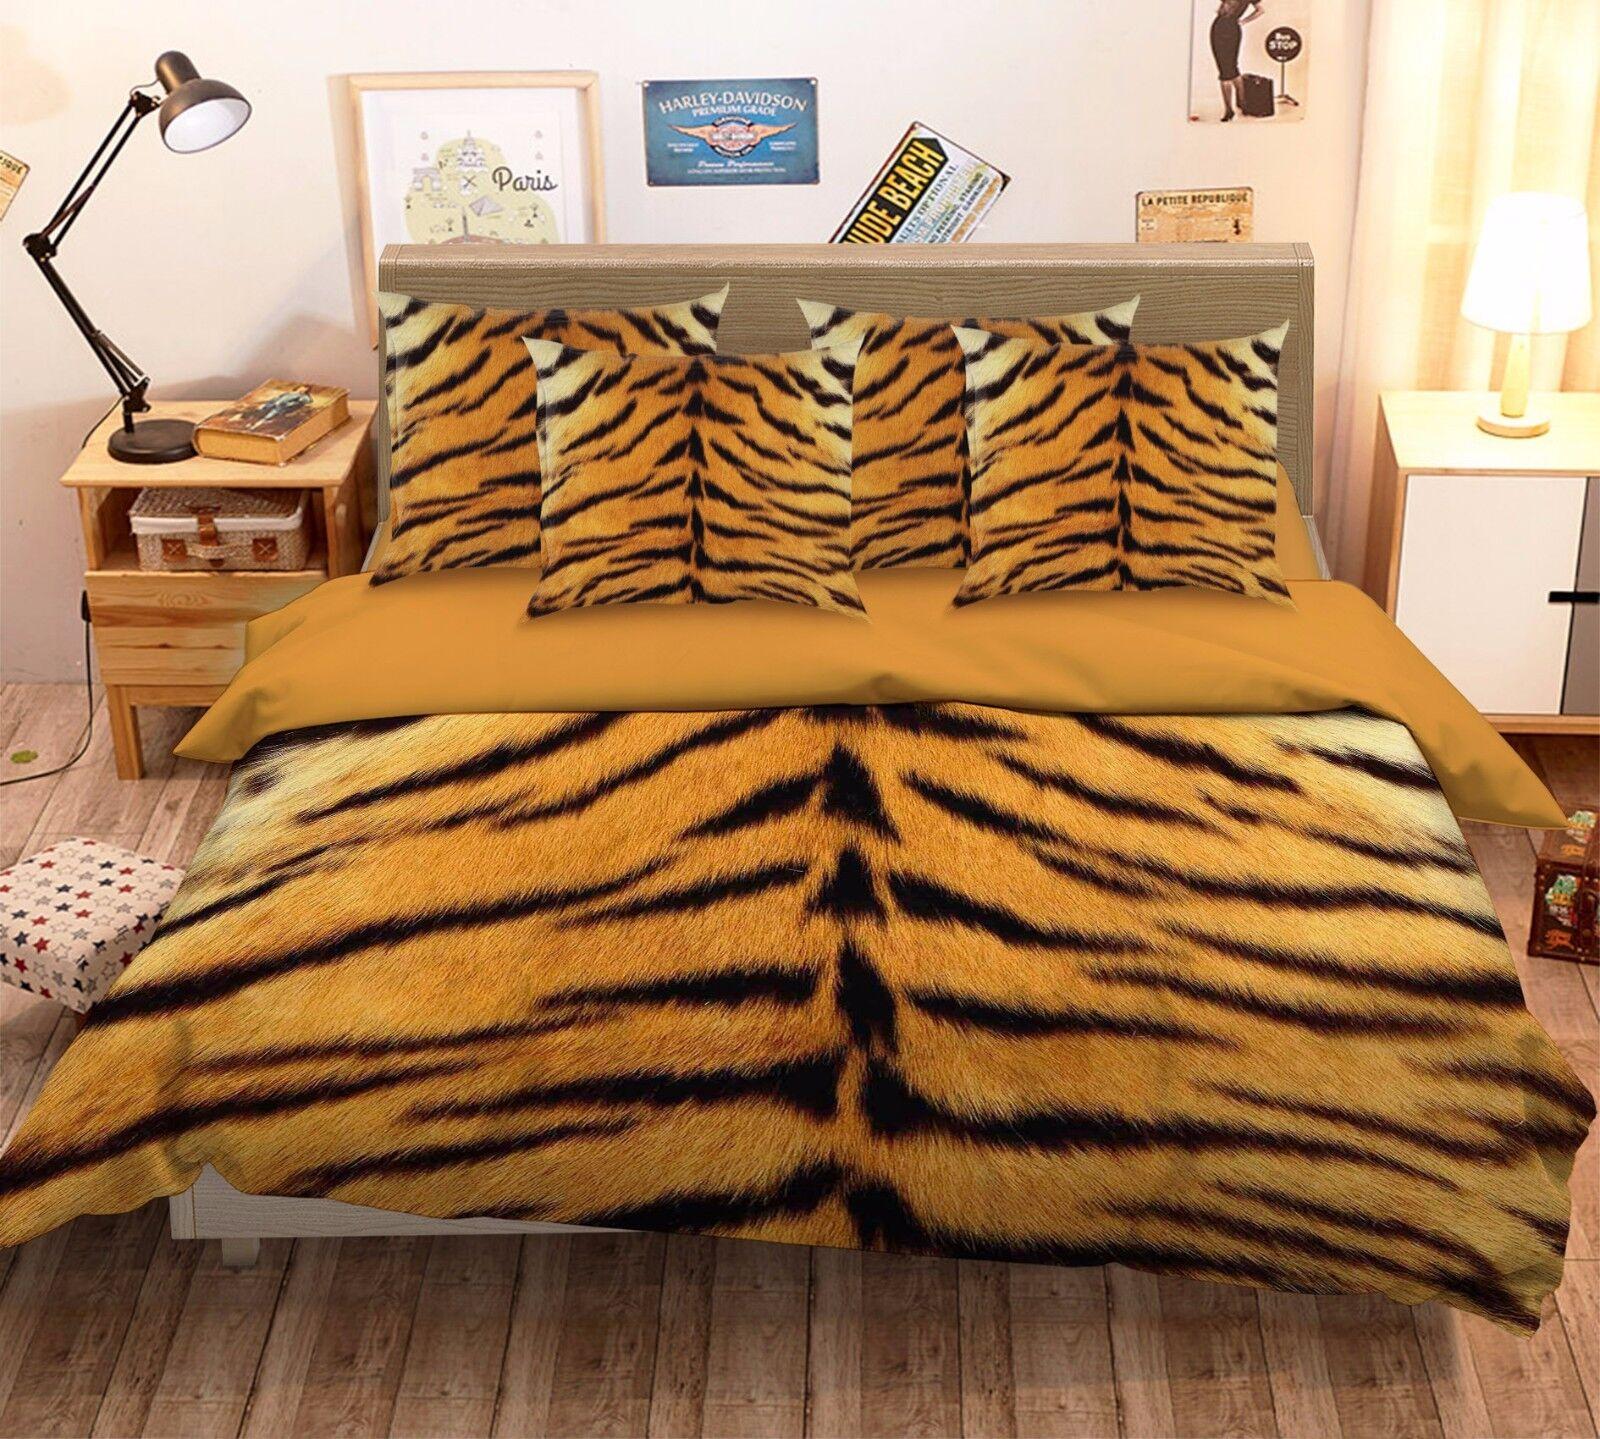 3d Tiger 468 Bed Cushion Covers Stitch Duvet Cover Set Single de voiturely